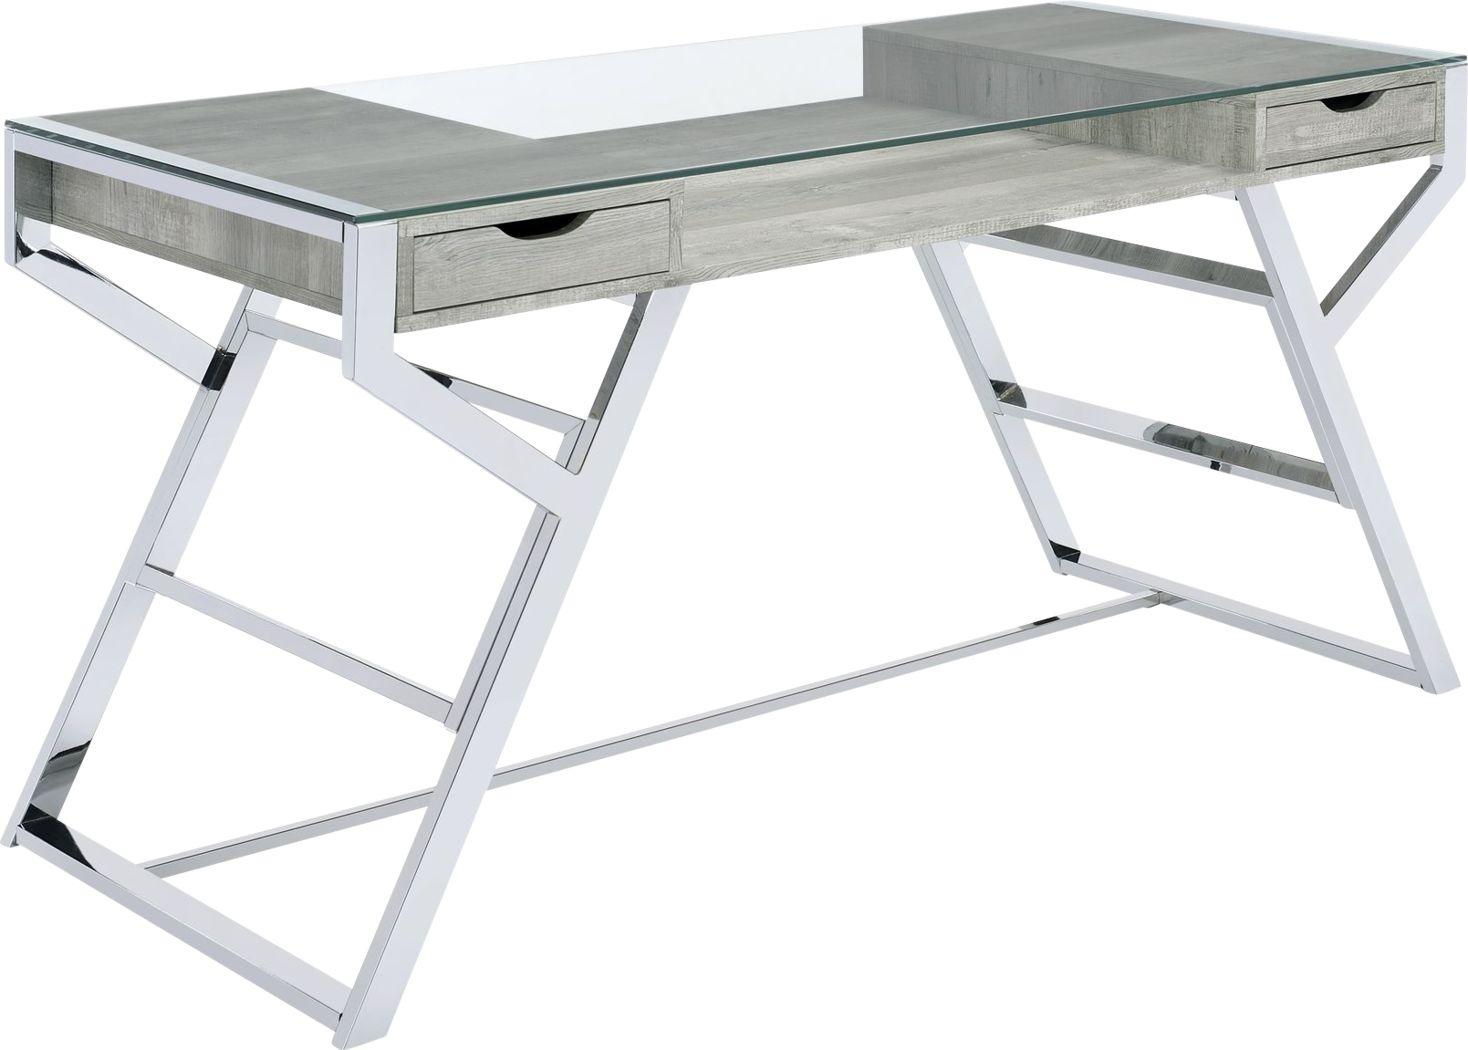 Hattaway Gray Desk